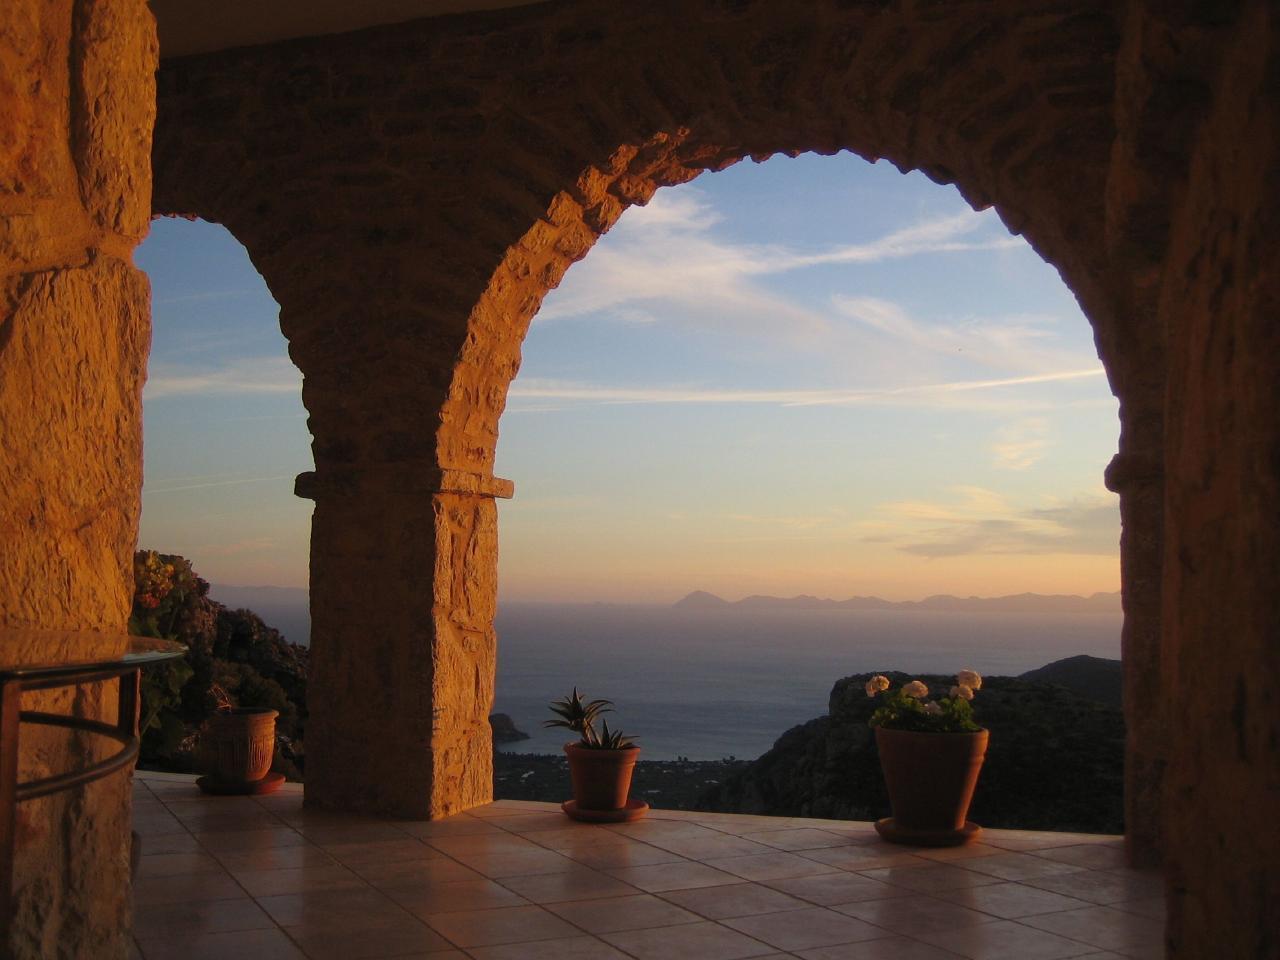 Maison de vacances Exklusives Chalet, romantisch am Berghang und Meer gelegen (2506674), Mesudiye, , Région Egéenne, Turquie, image 33